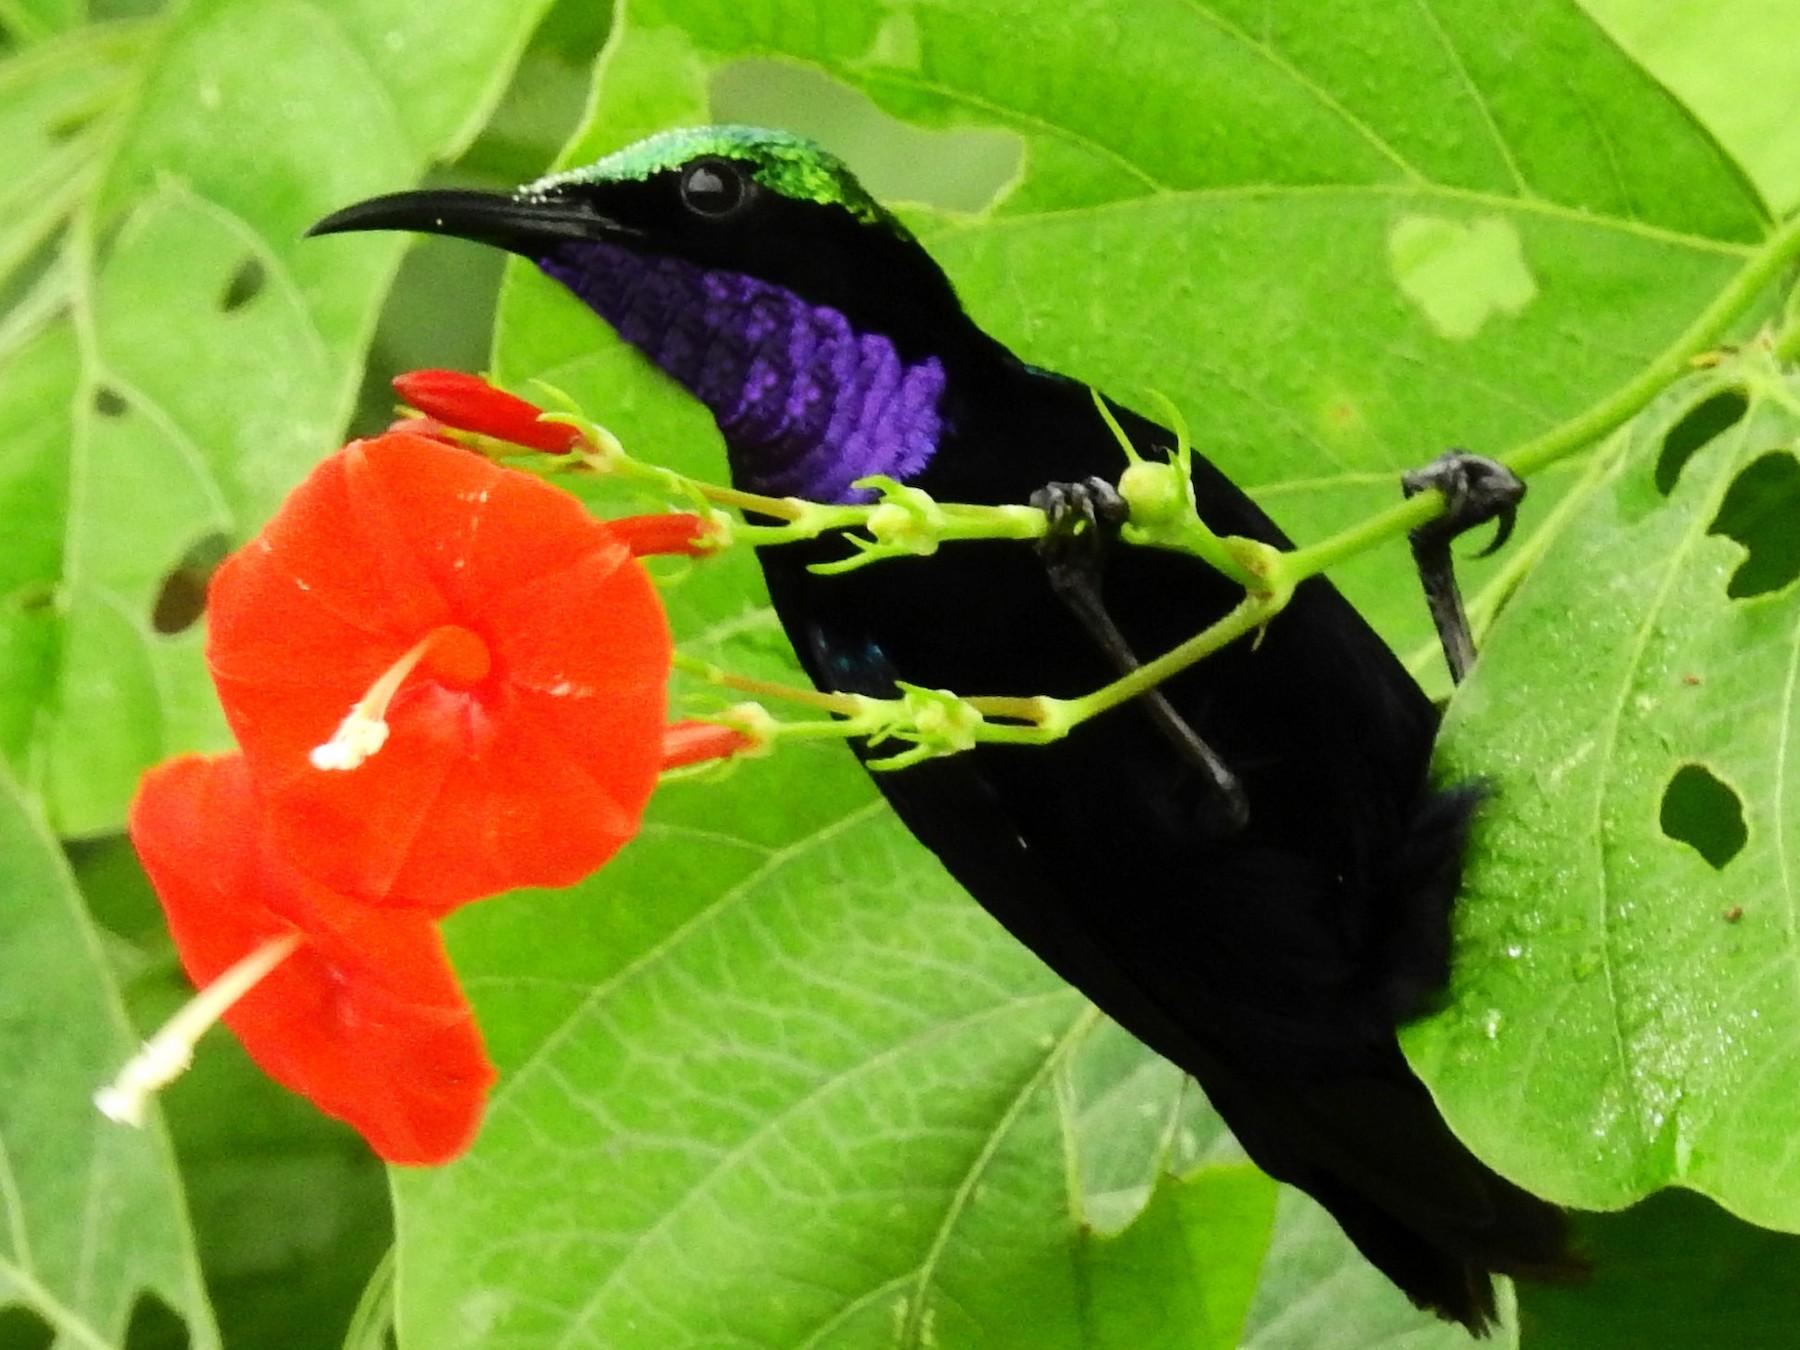 Black Sunbird - Panji Gusti Akbar